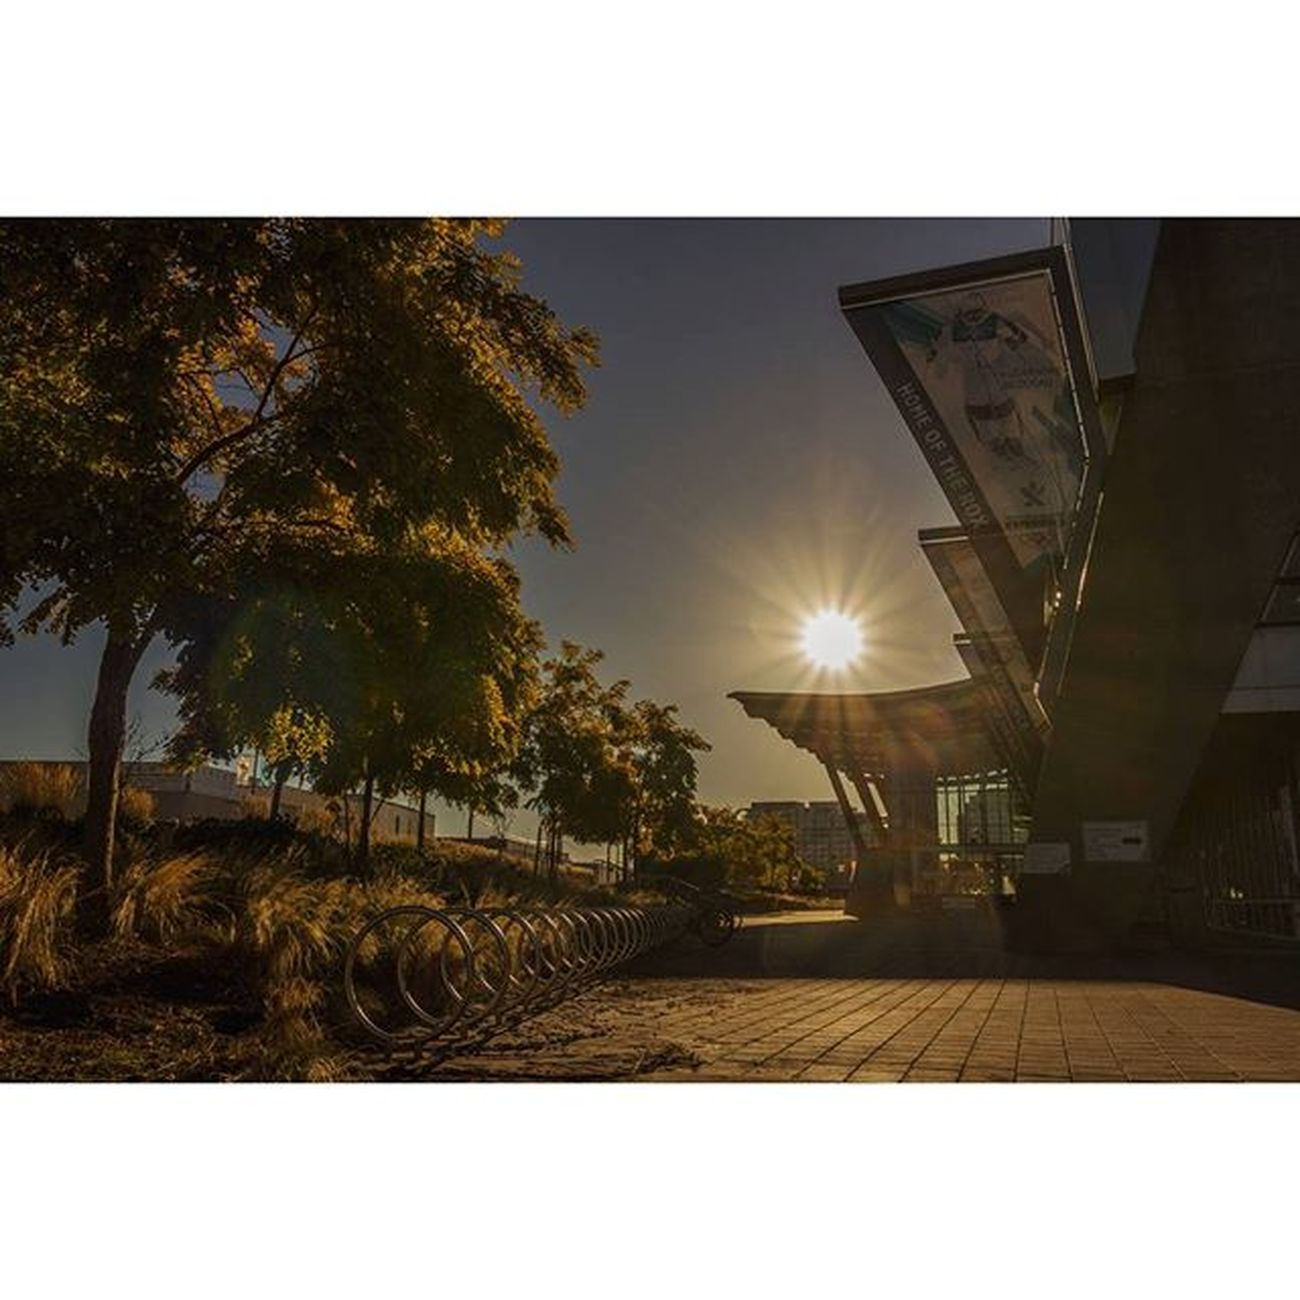 Home away from home pt.2 Oval Richmondoval Richmondolympicoval Richmond vancouver vancitybuzz vancity sunset landscape photography bc